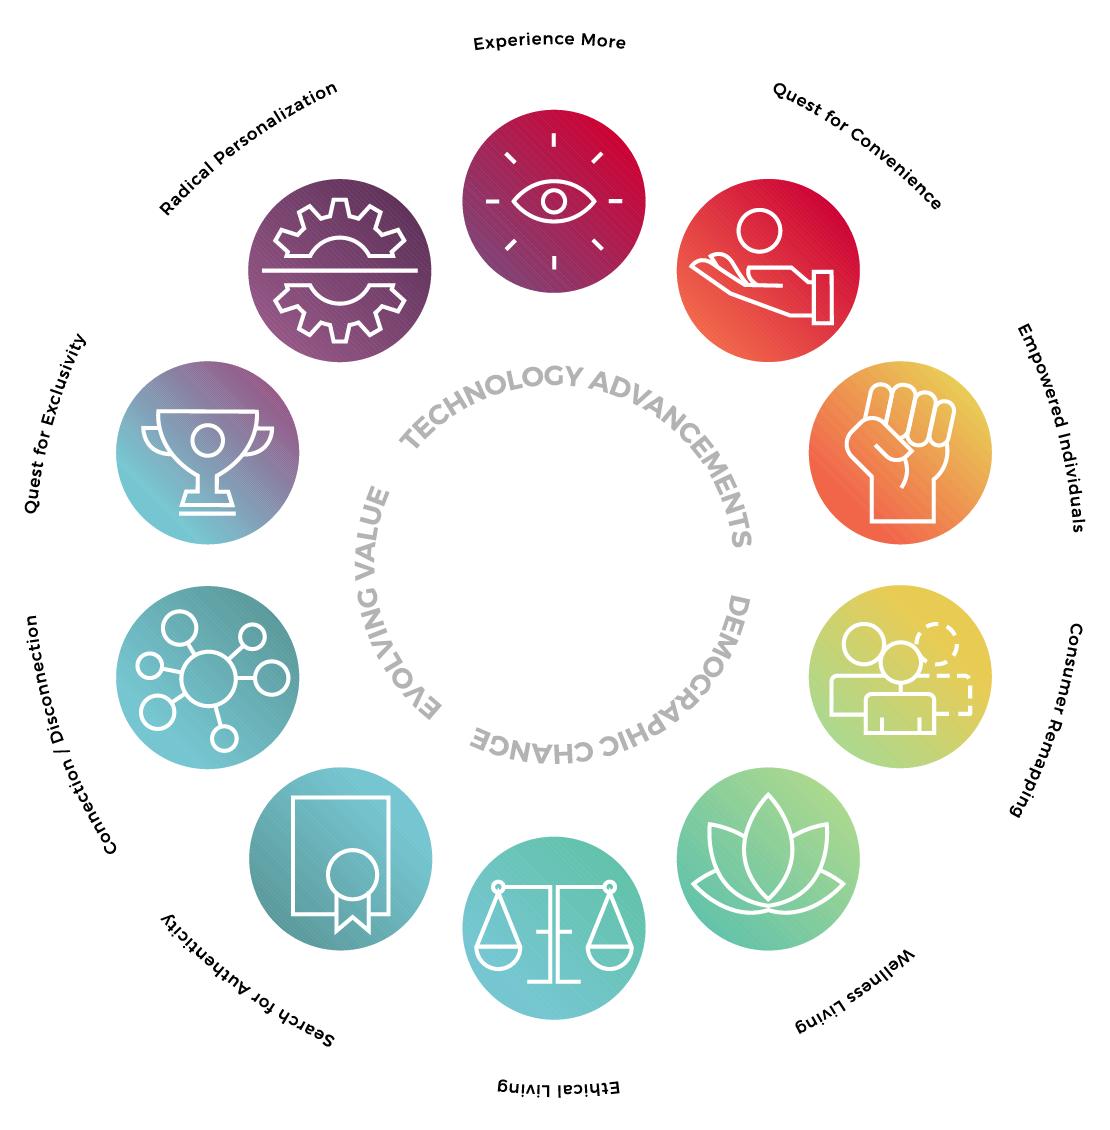 Bresslergroup's consumer megatrends framework